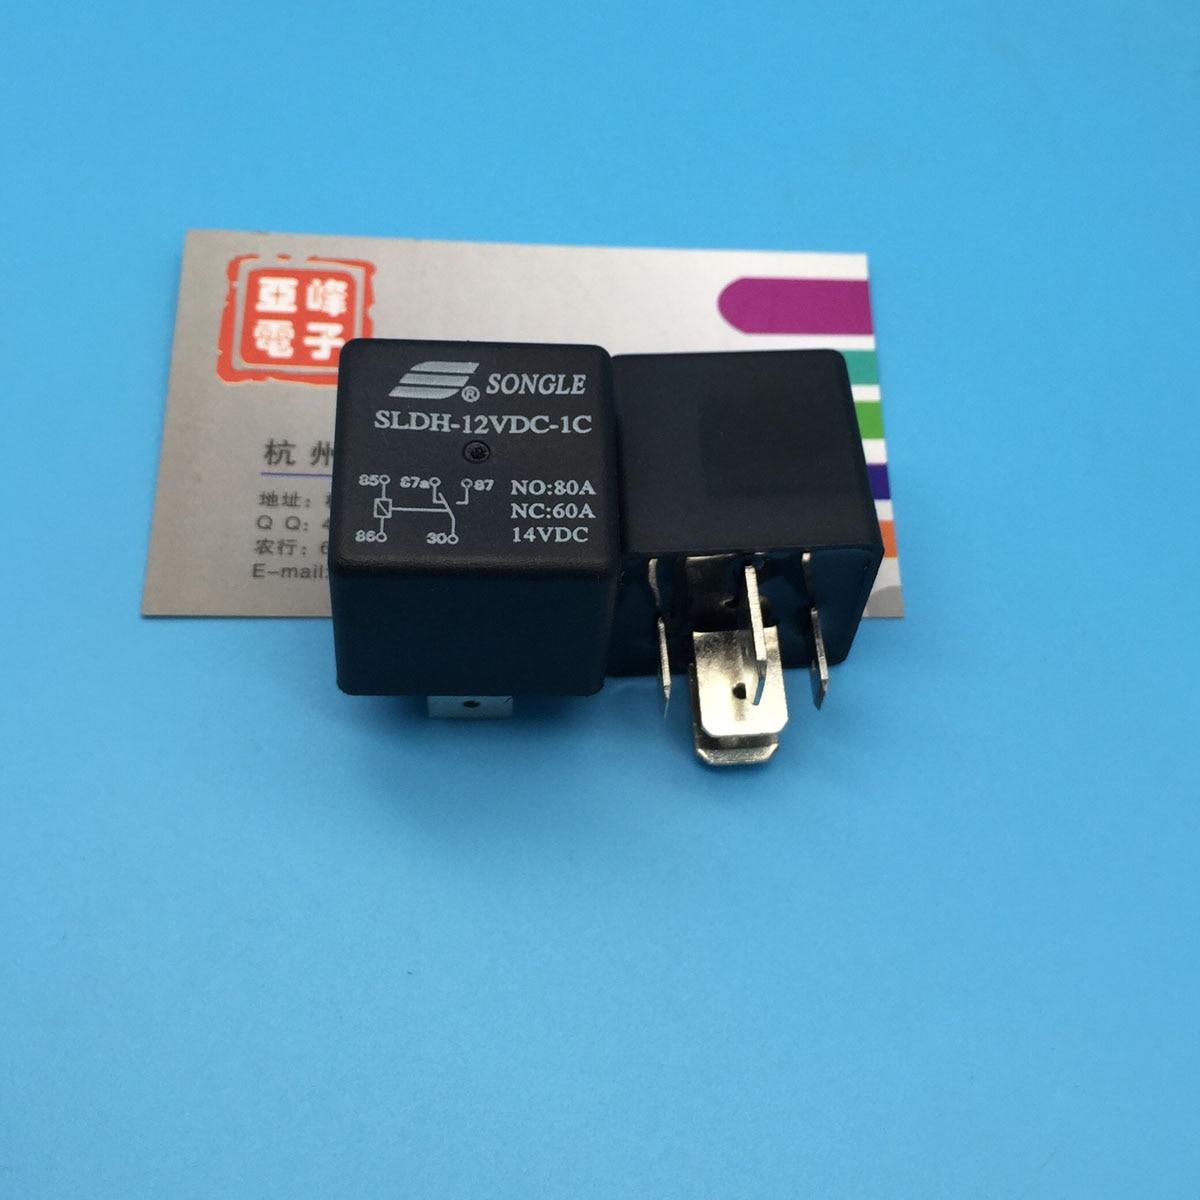 Song Le relay SLDH 12V 1C a set of conversion 5 pin 60A14V